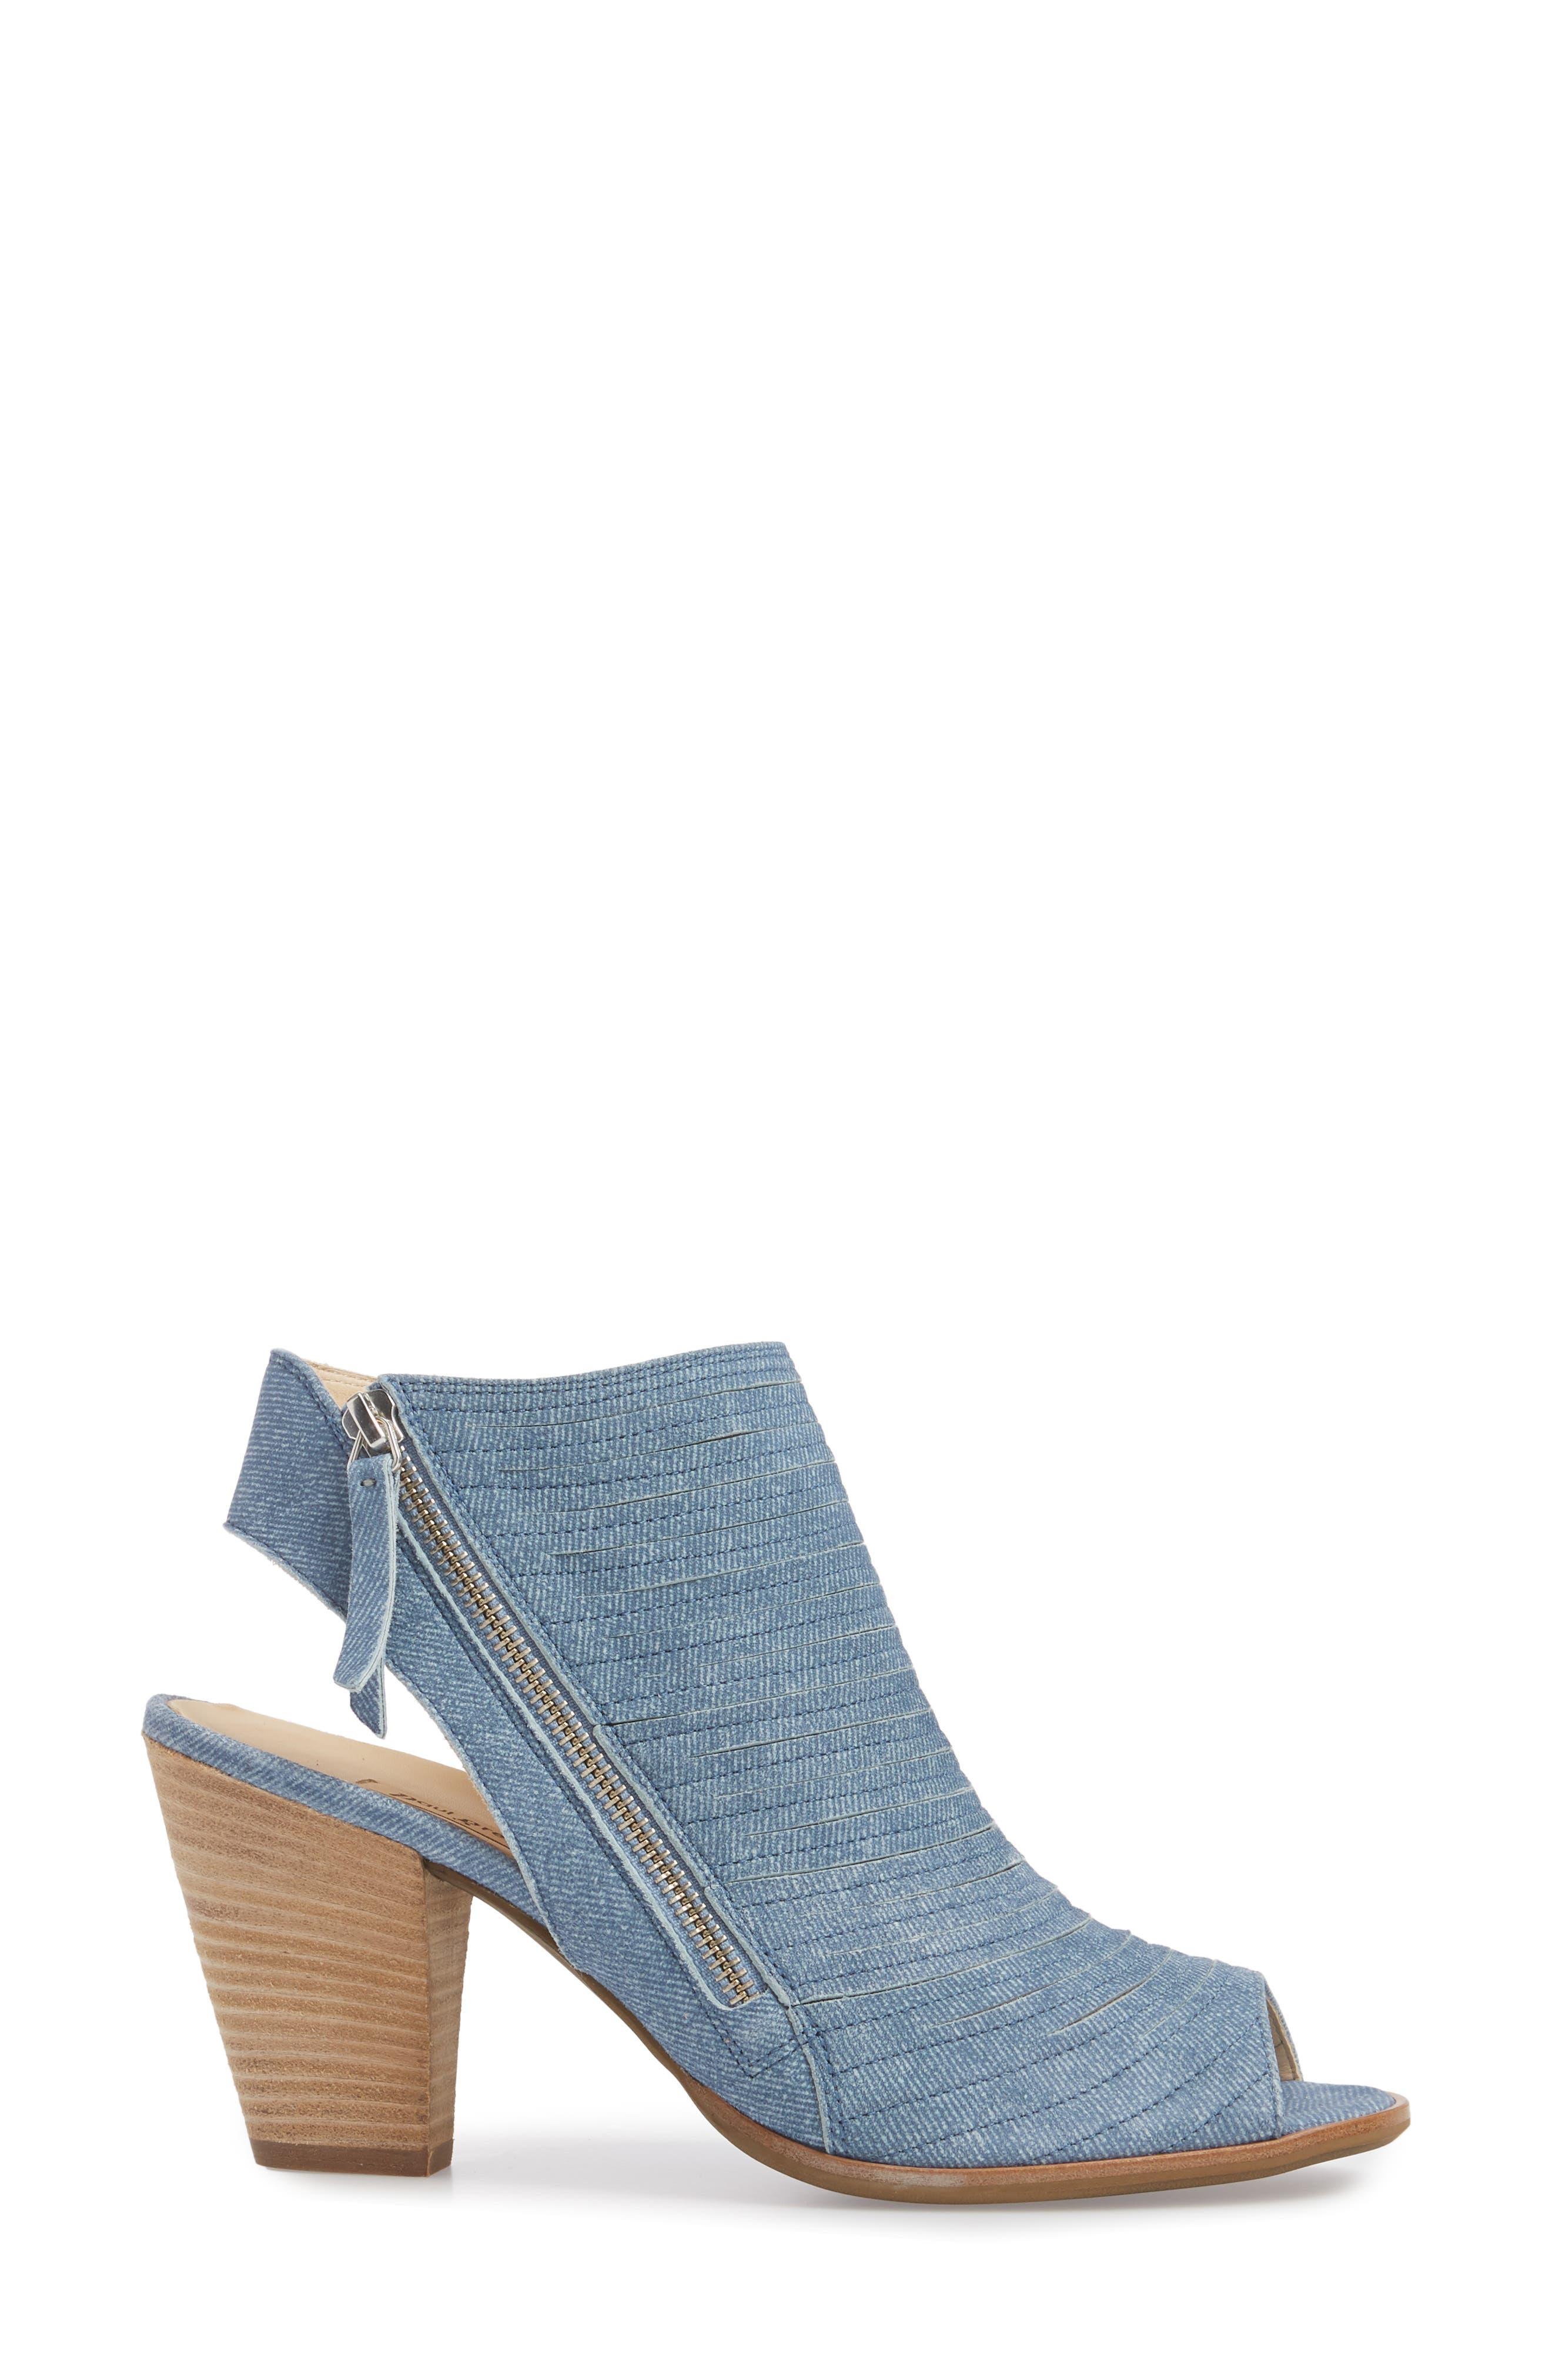 'Cayanne' Leather Peep Toe Sandal,                             Alternate thumbnail 20, color,